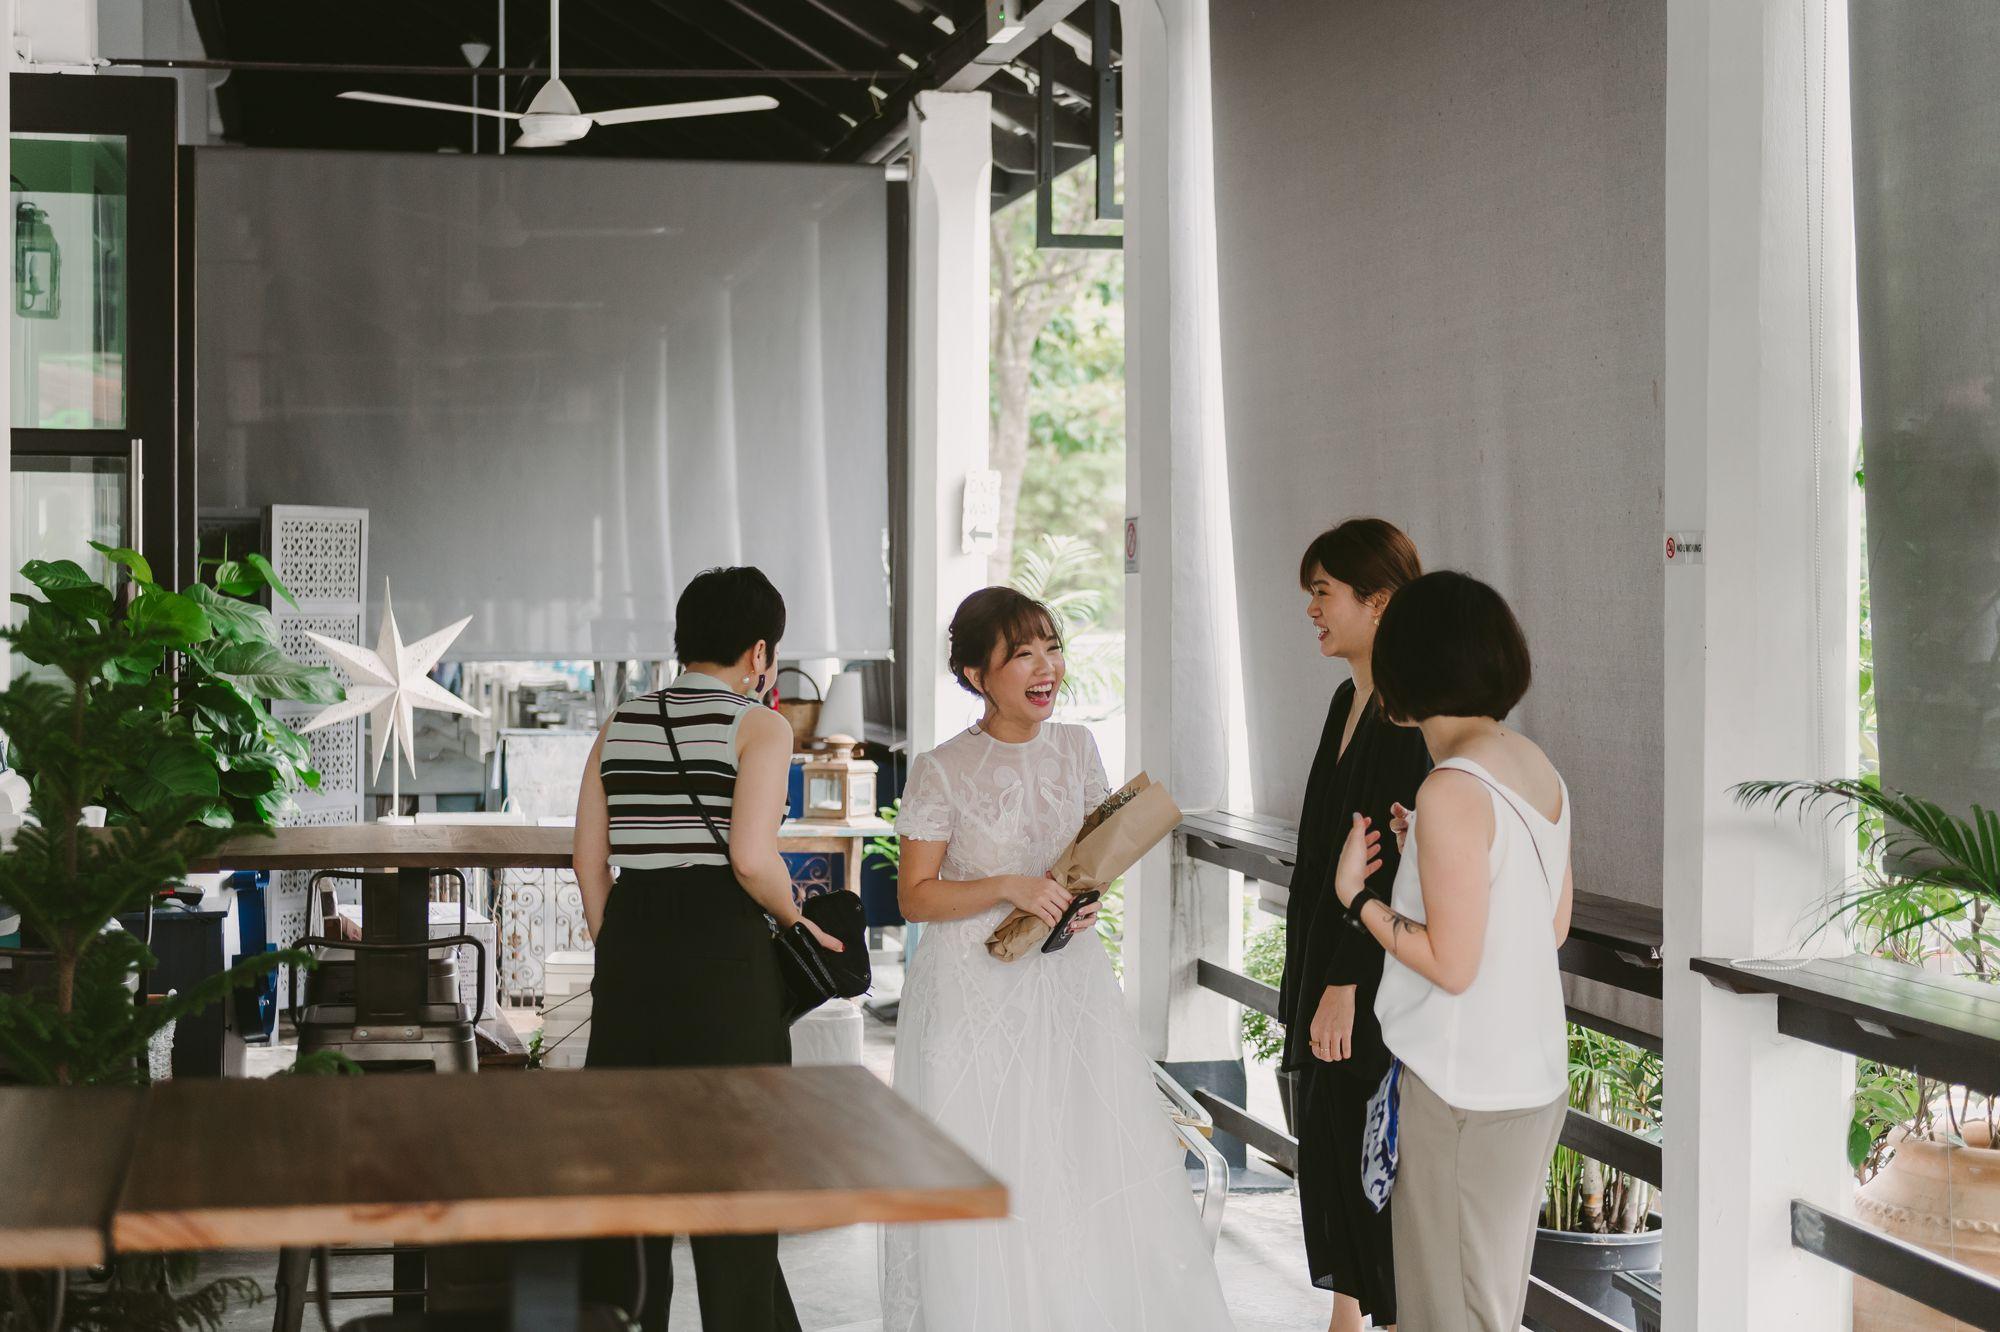 wedding_photography 7.jpg